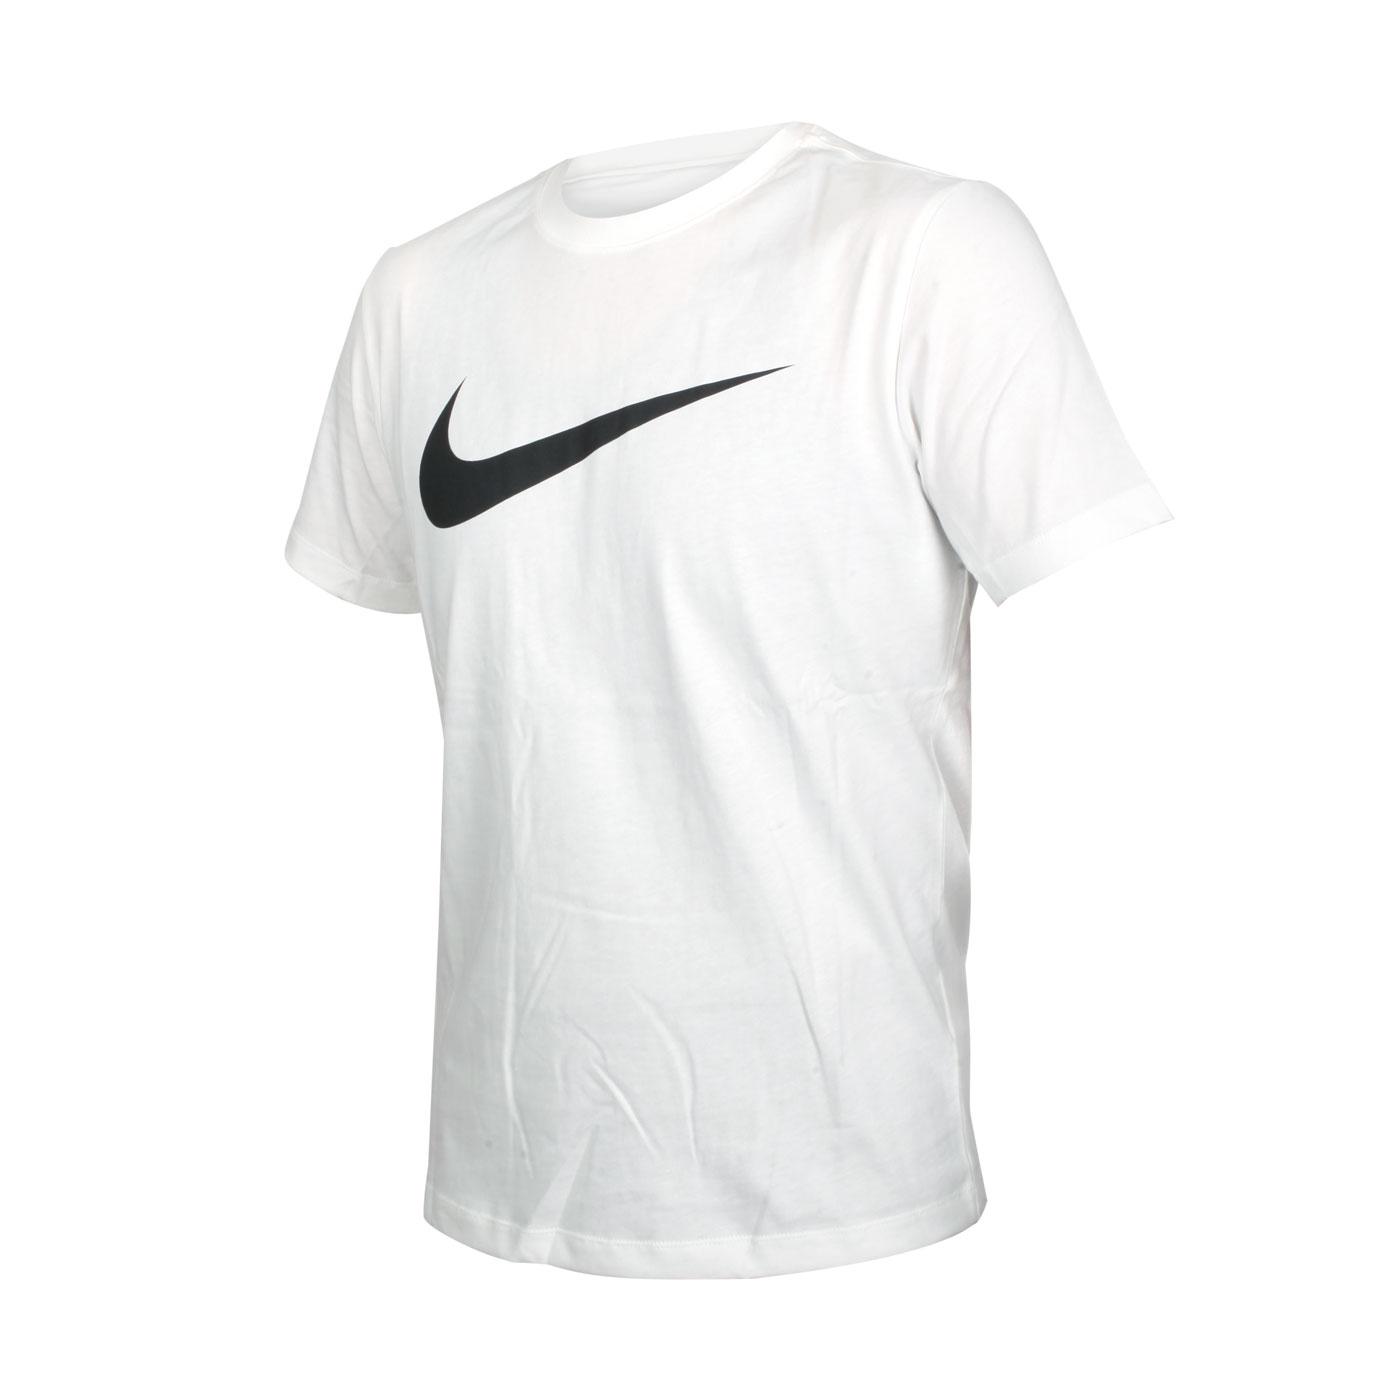 NIKE 男款短袖T恤 DC5095-100 - 白黑